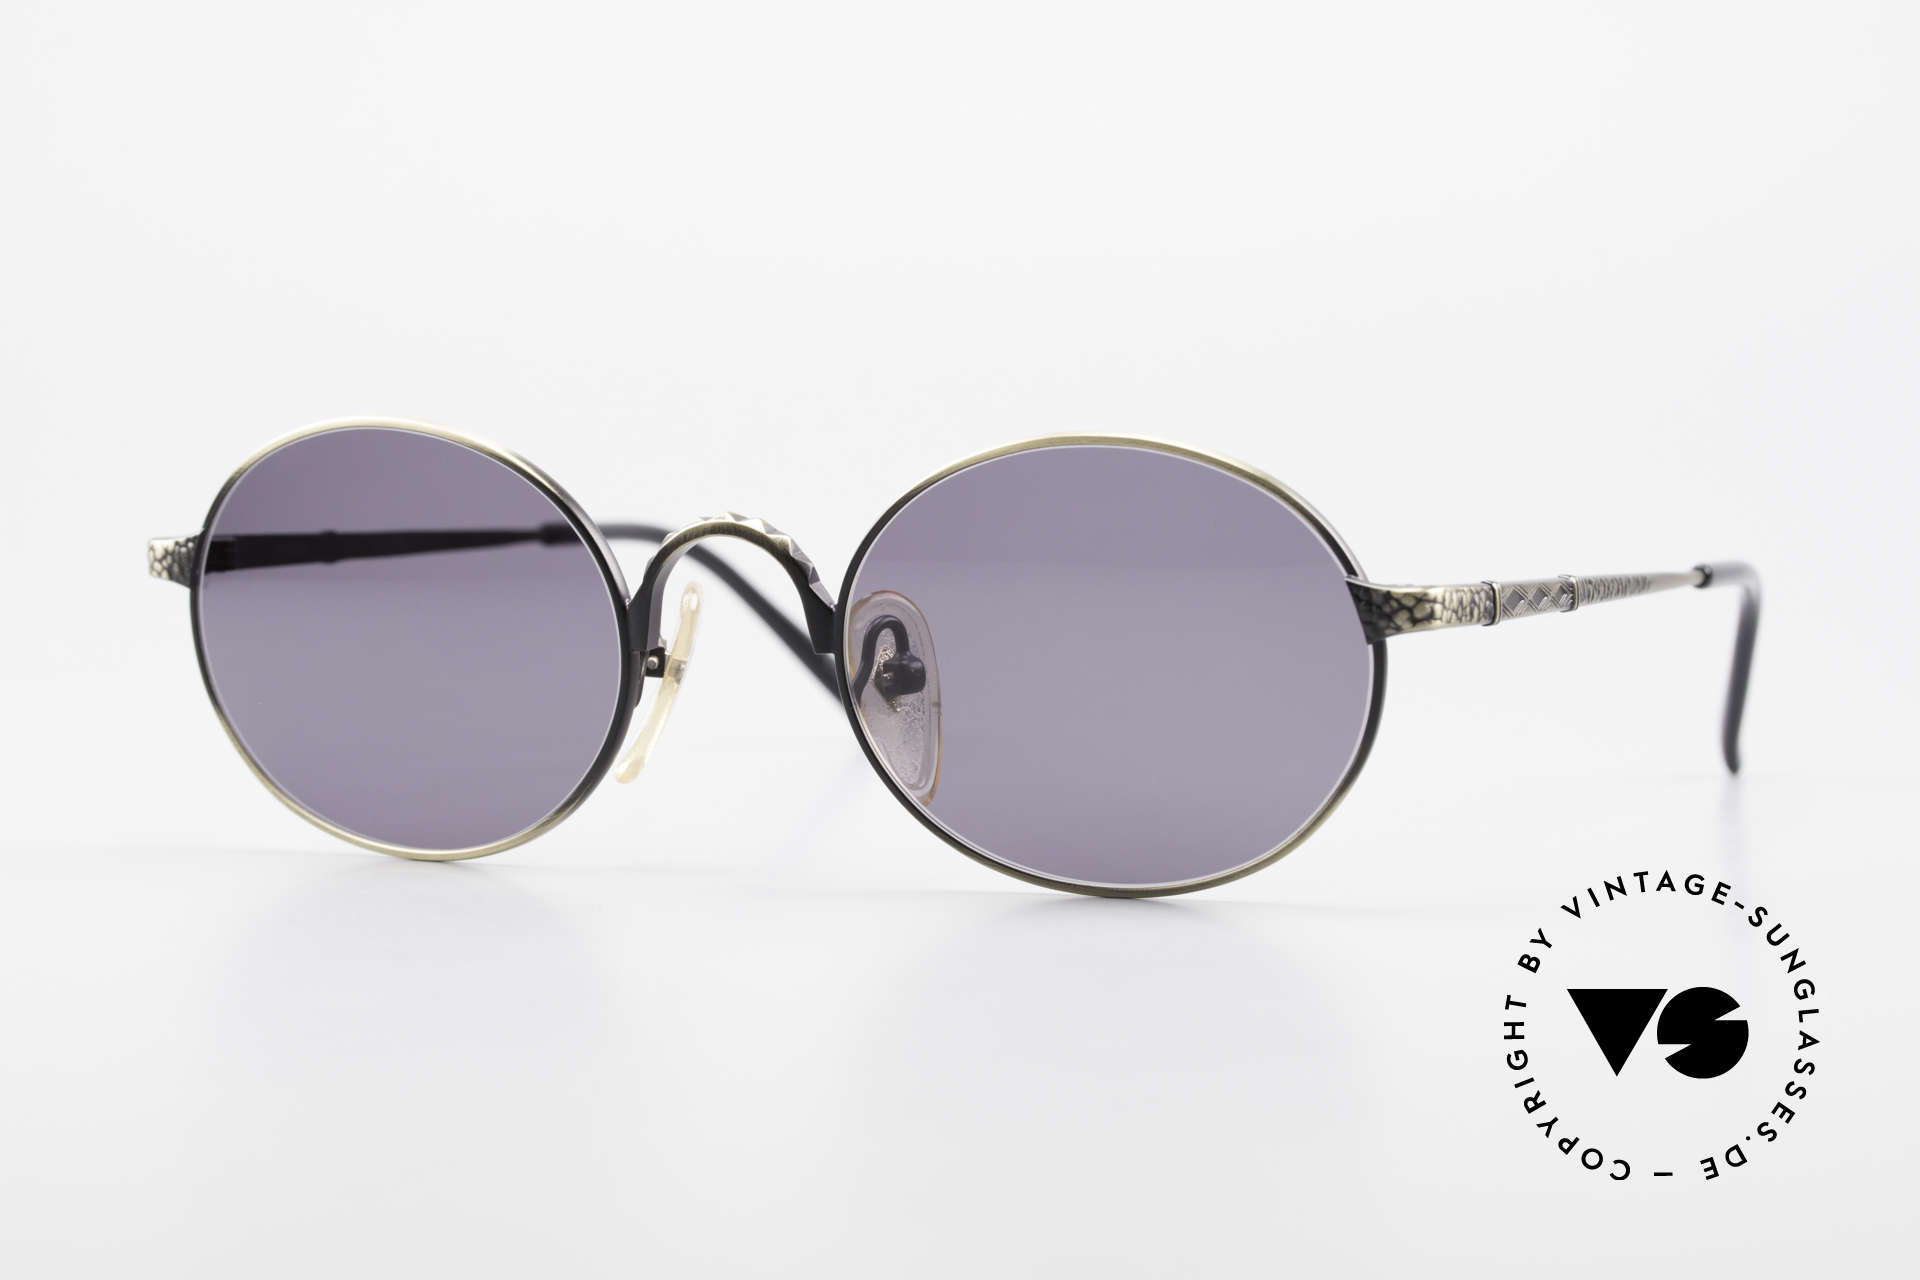 Jean Paul Gaultier 55-9672 Oval 1990's JPG Sunglasses, oval Jean Paul GAULTIER designer sunglasses, Made for Men and Women